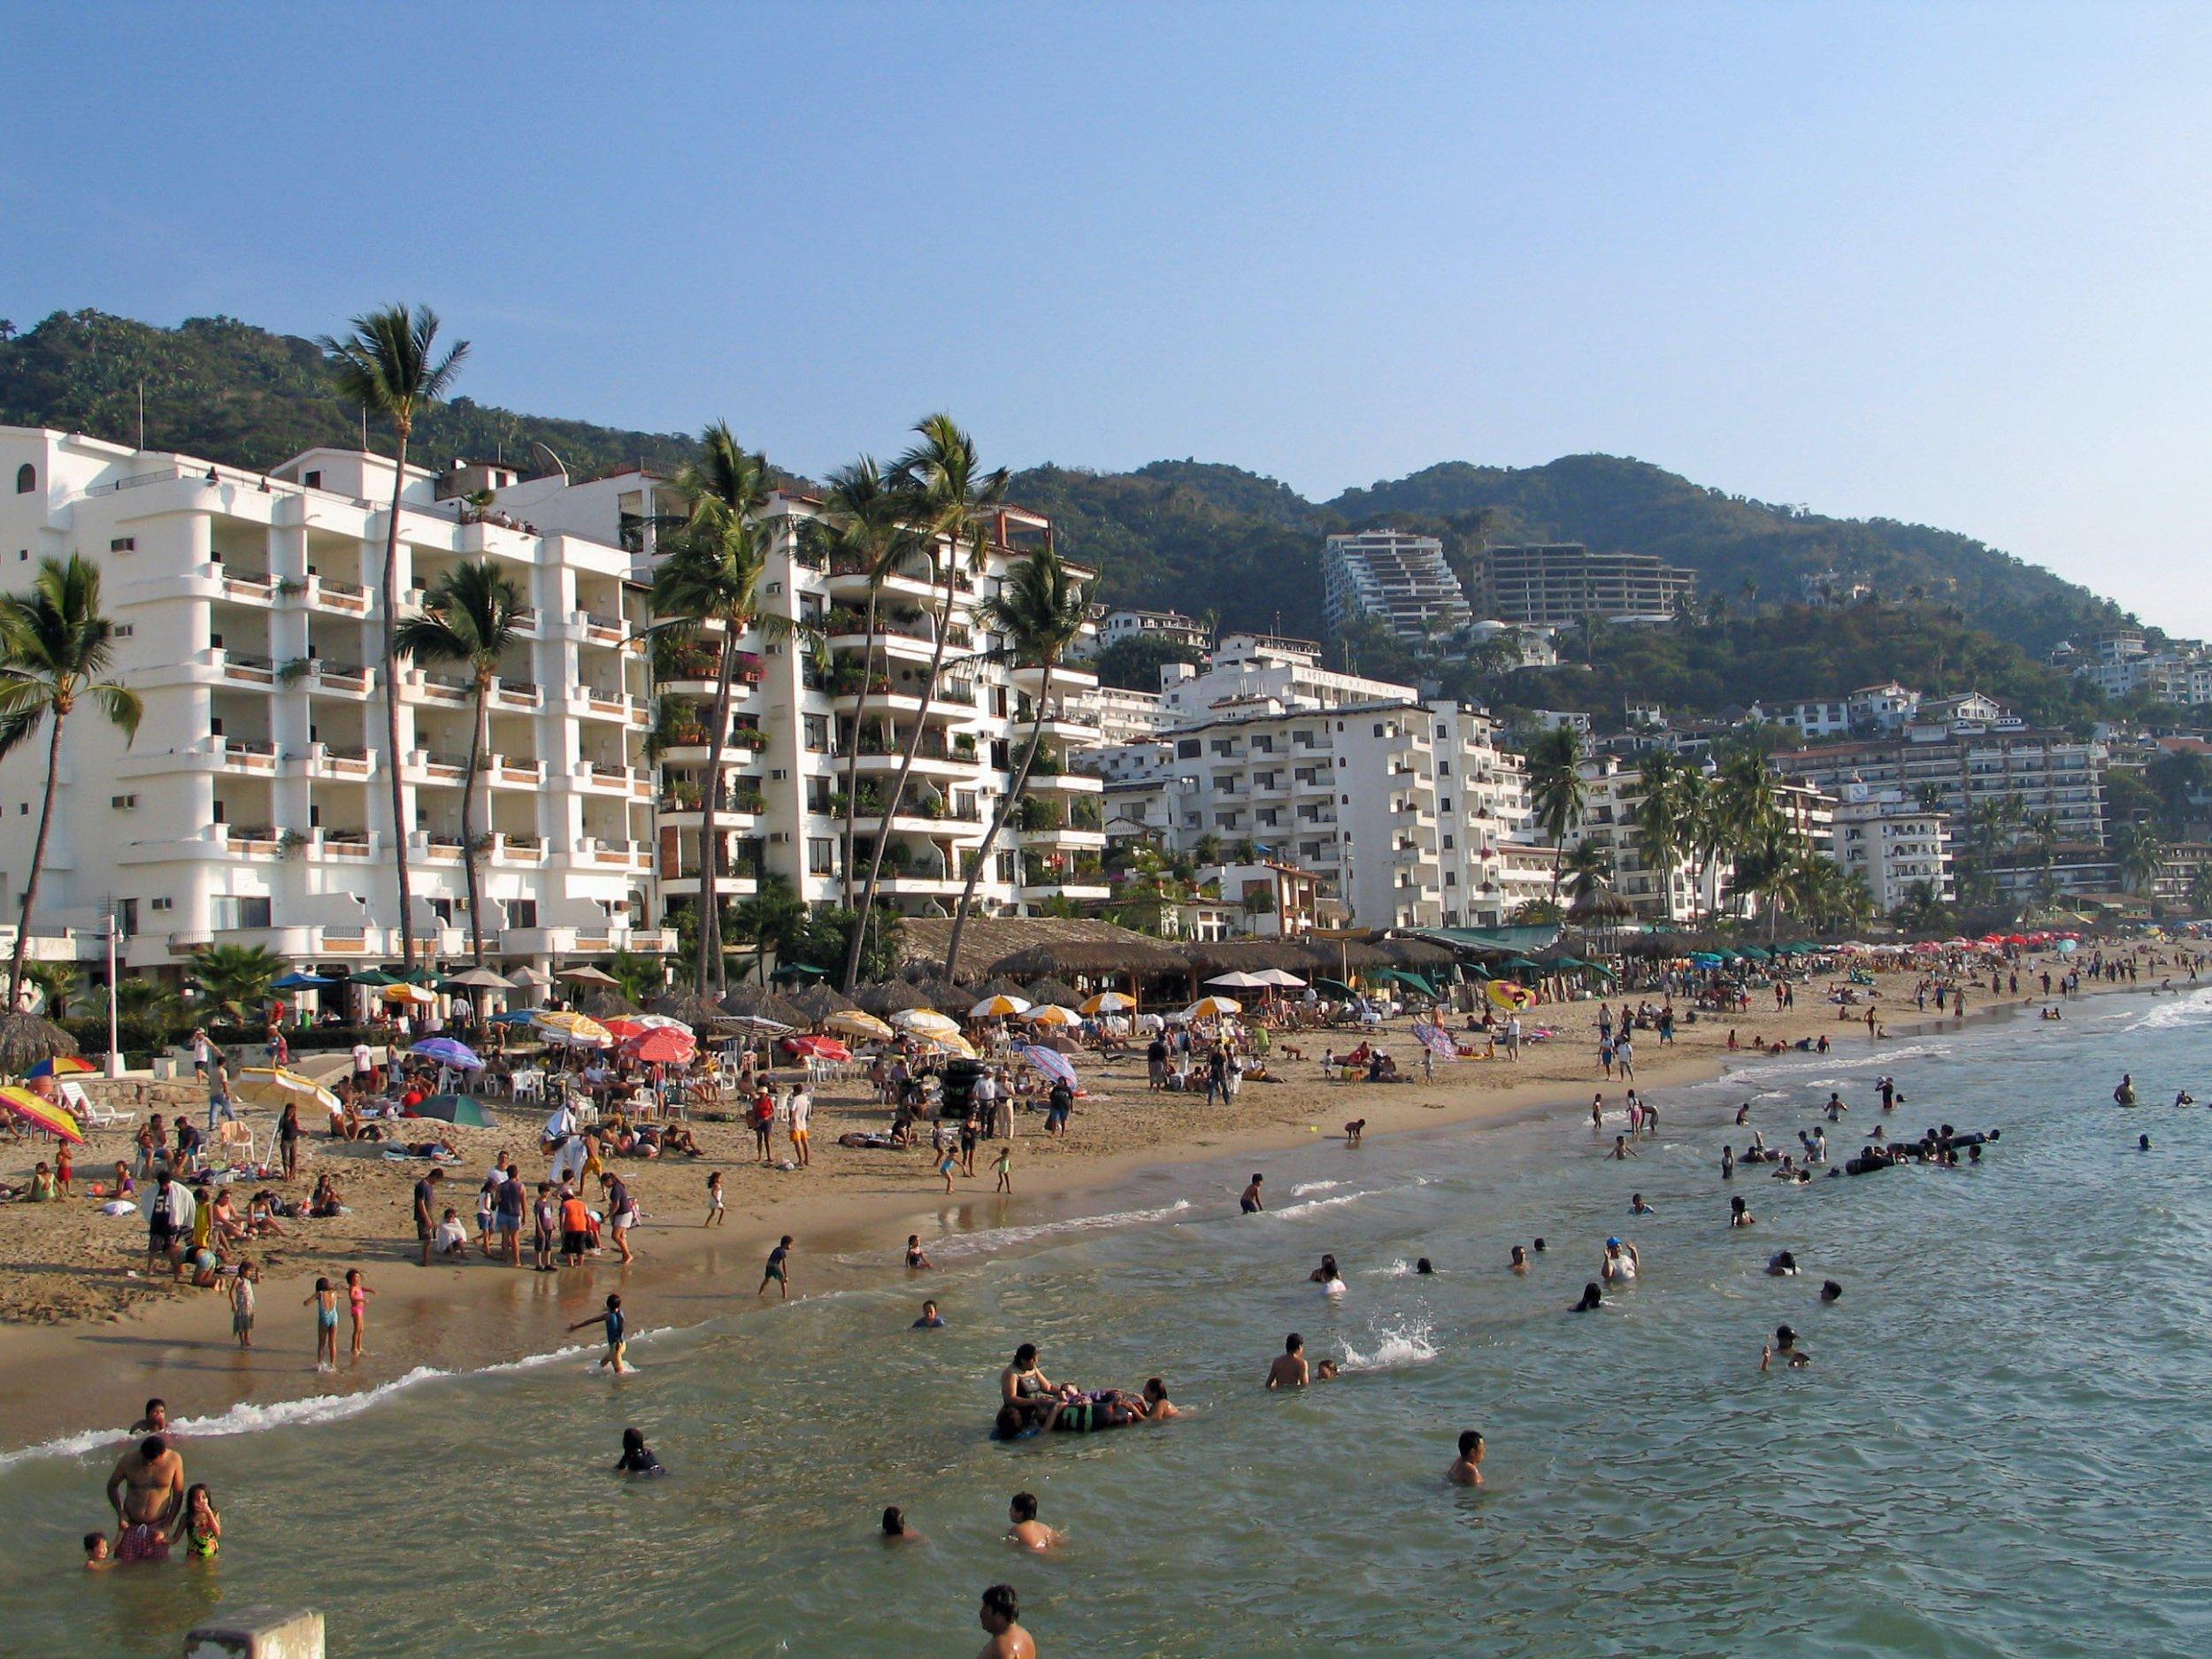 Playa Los Muertos, Puerta Vallarta's gay beach